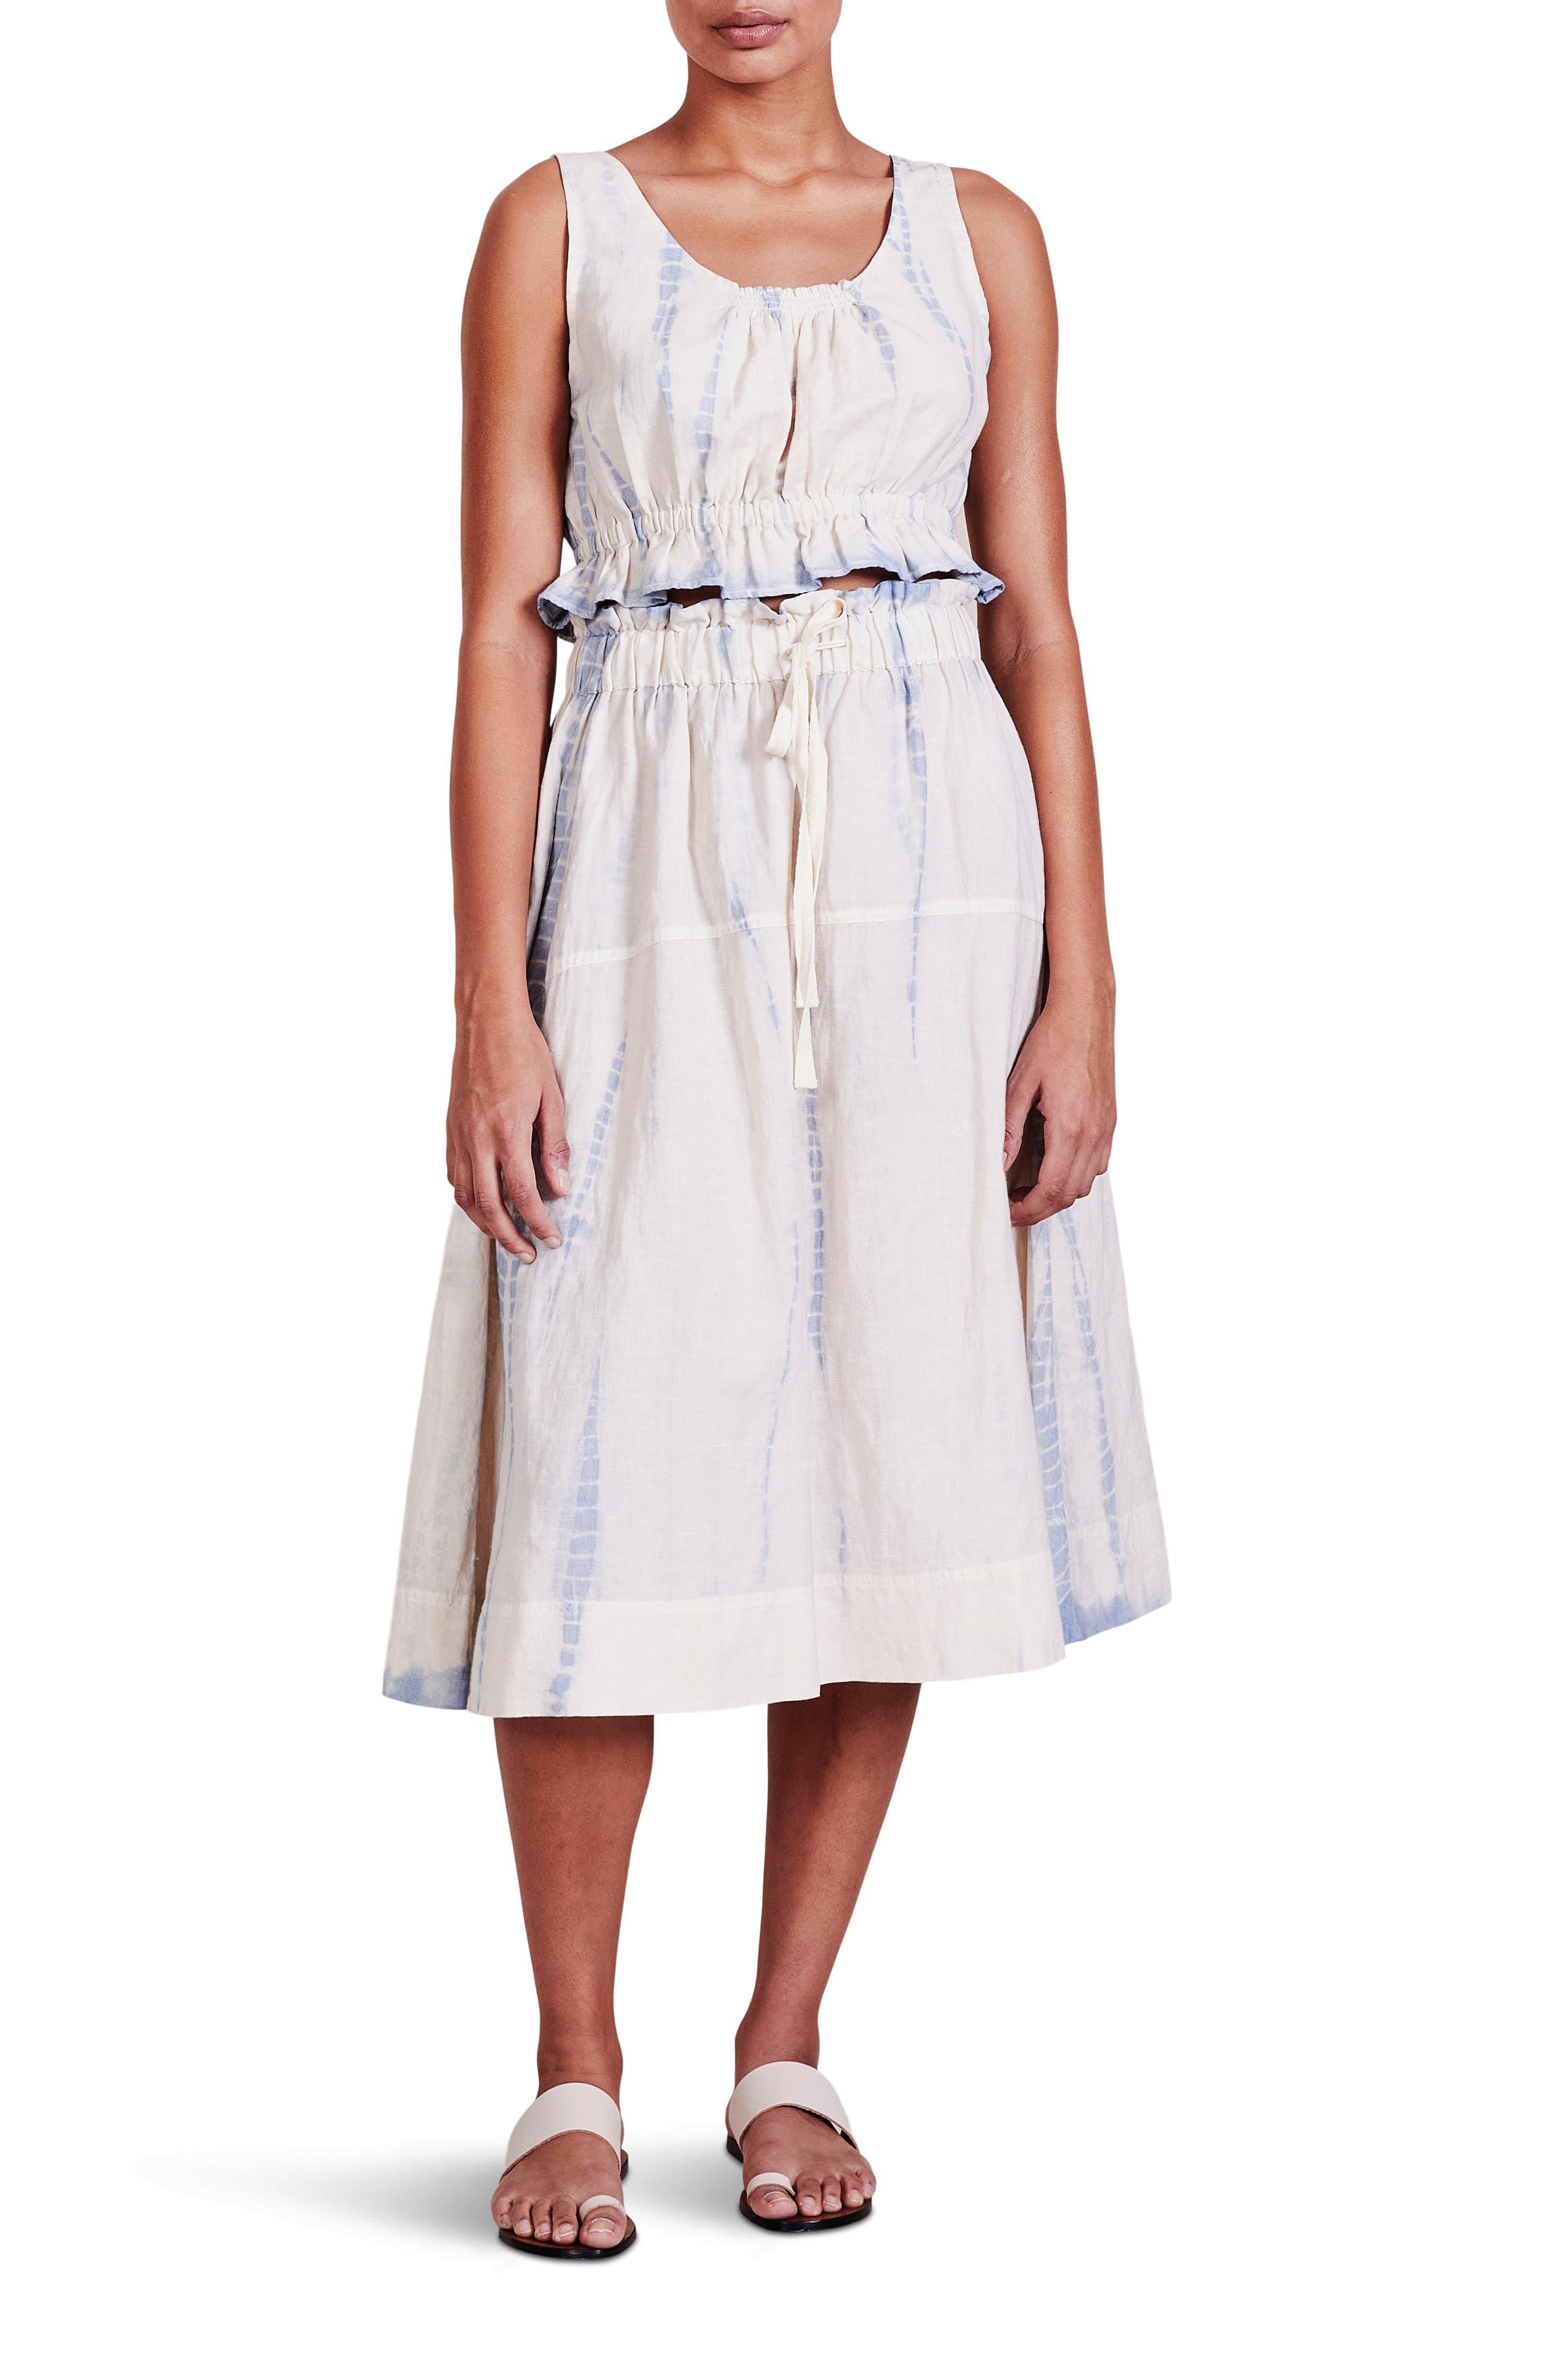 Hermosa Organic Cotton Blend Skirt